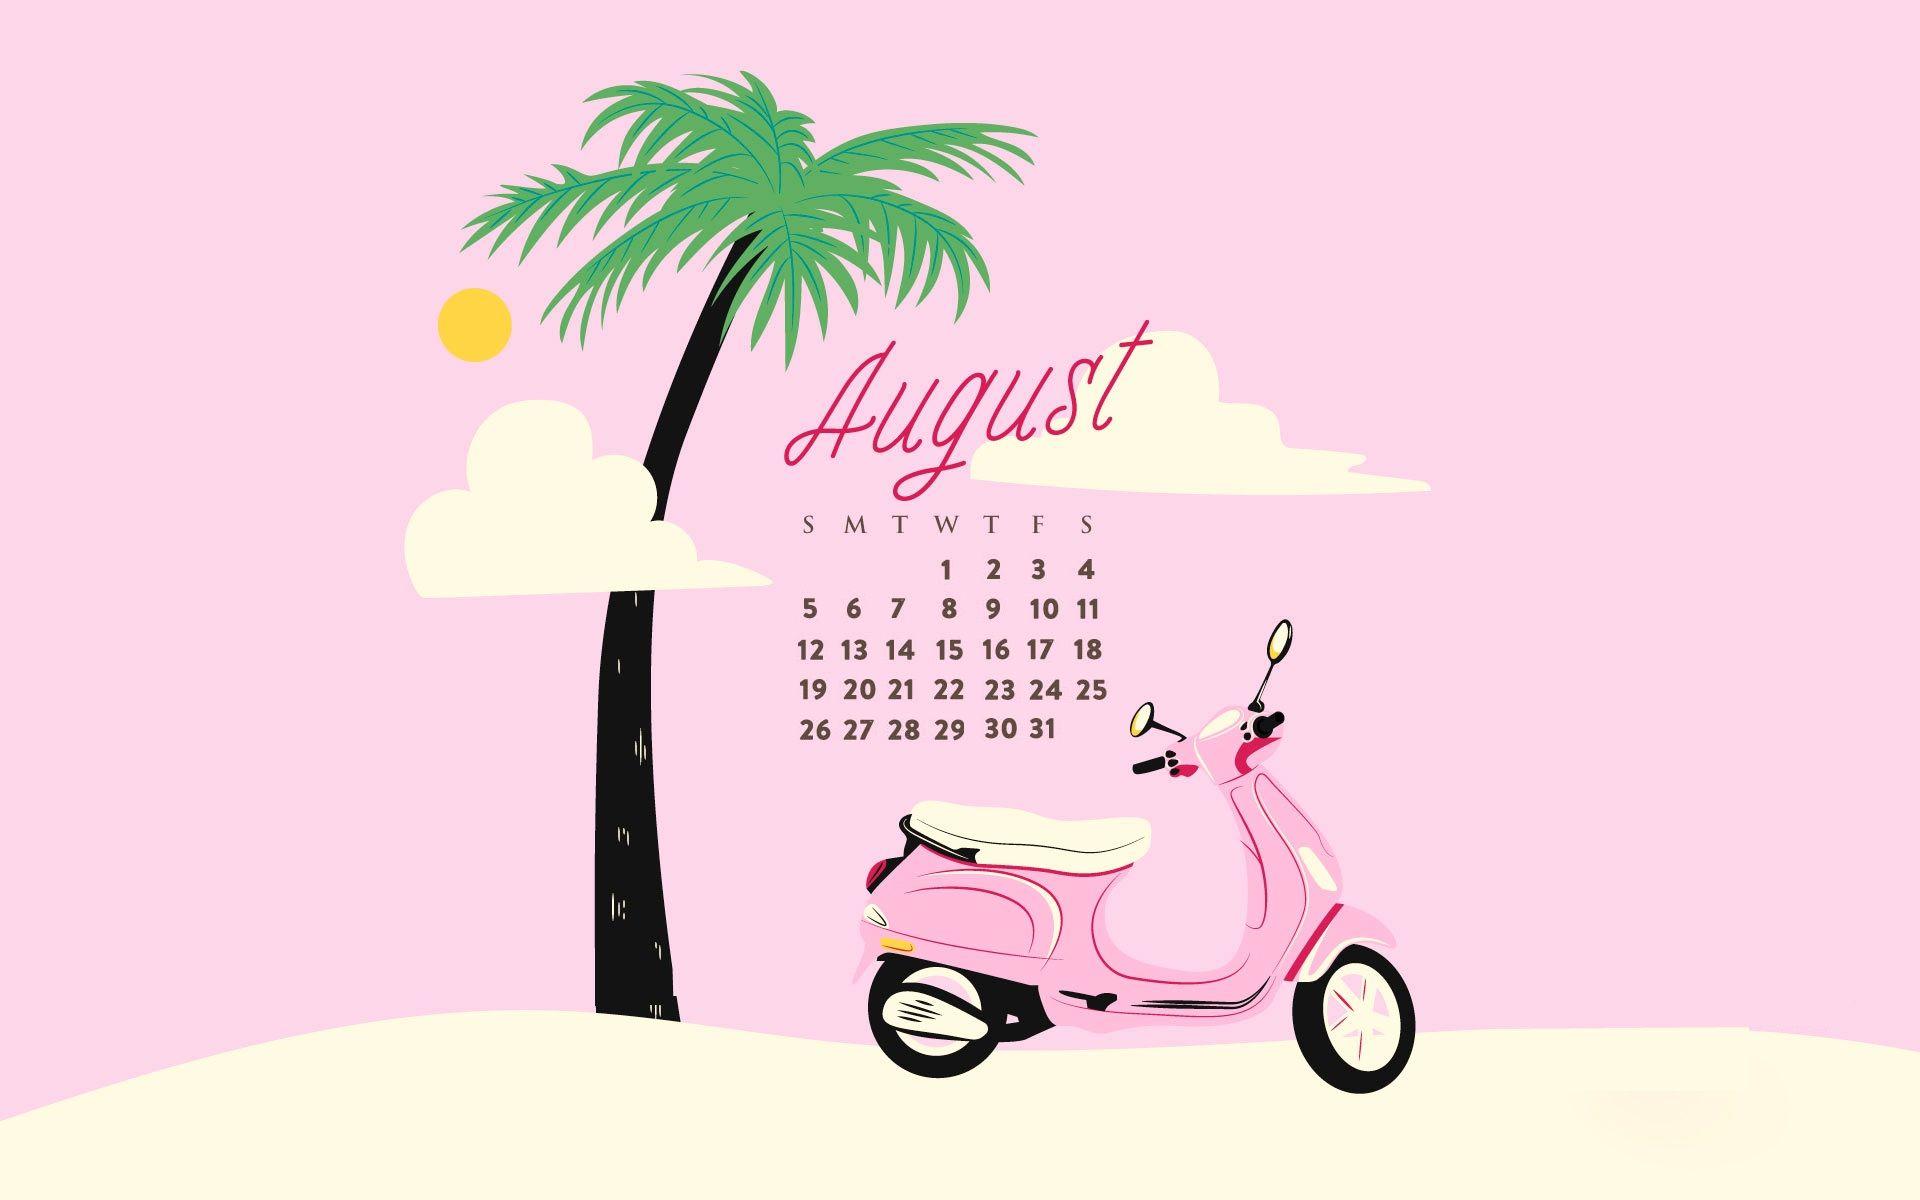 August 2018 Calendar Wallpapers Achtergronden Laptop Achtergrond Laptop